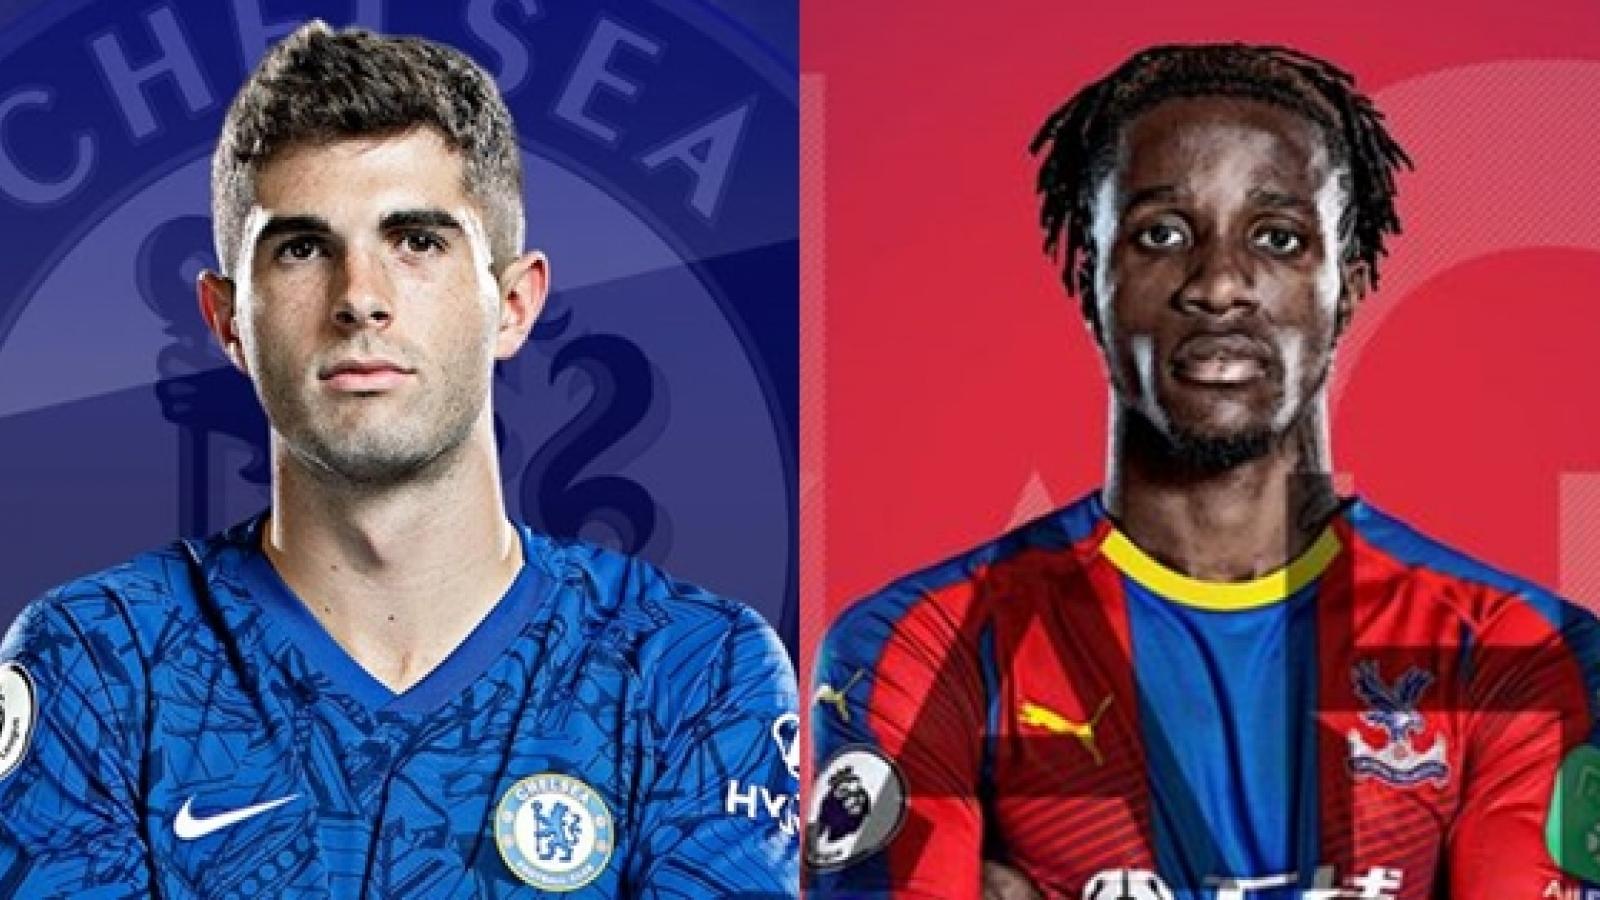 Đội hình dự kiến Crystal Palace - Chelsea: Pulisic đá cặp Giroud?